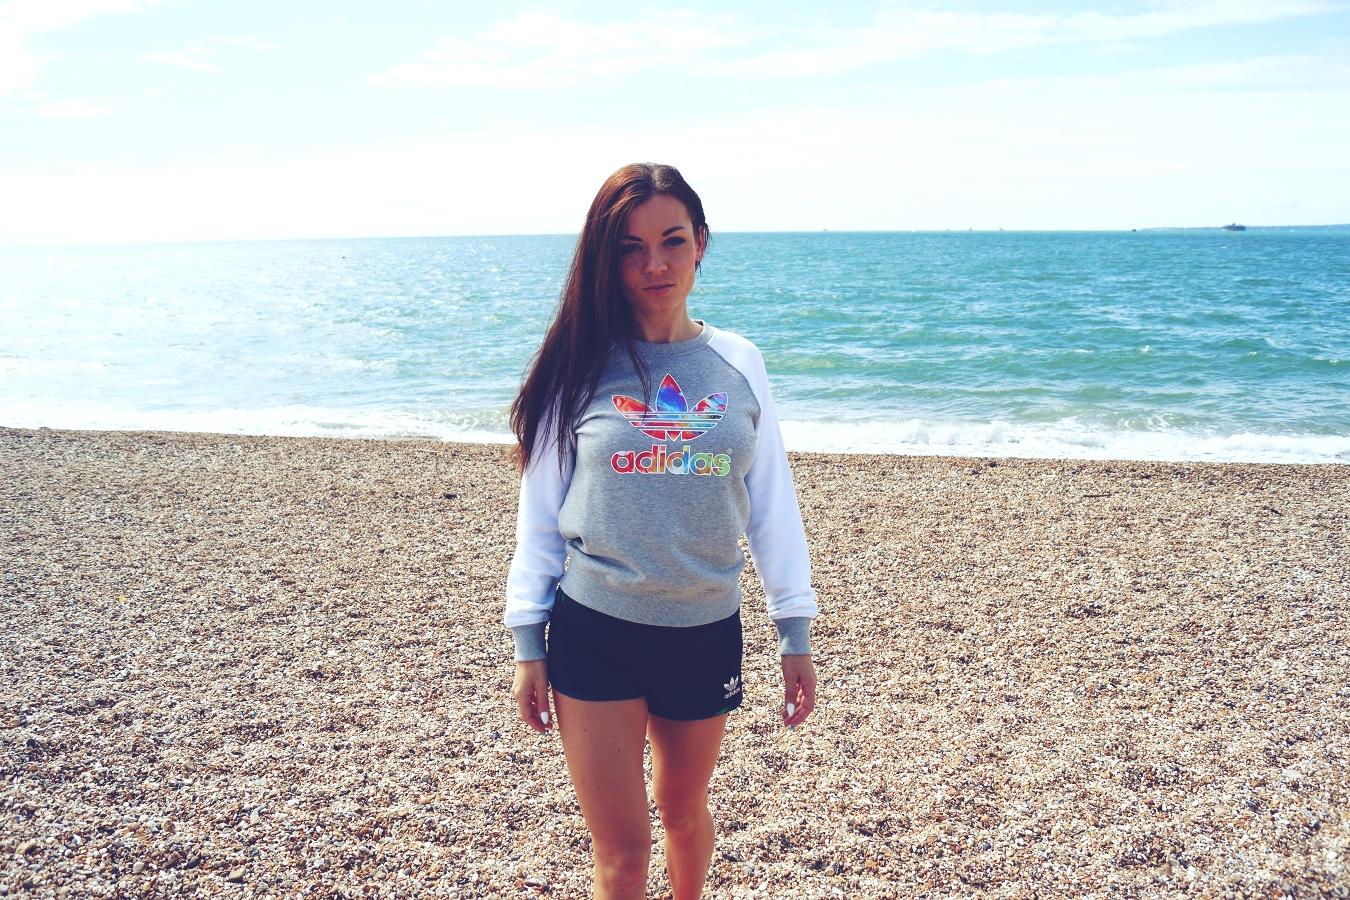 fitness blogger belucce minko jo -jo